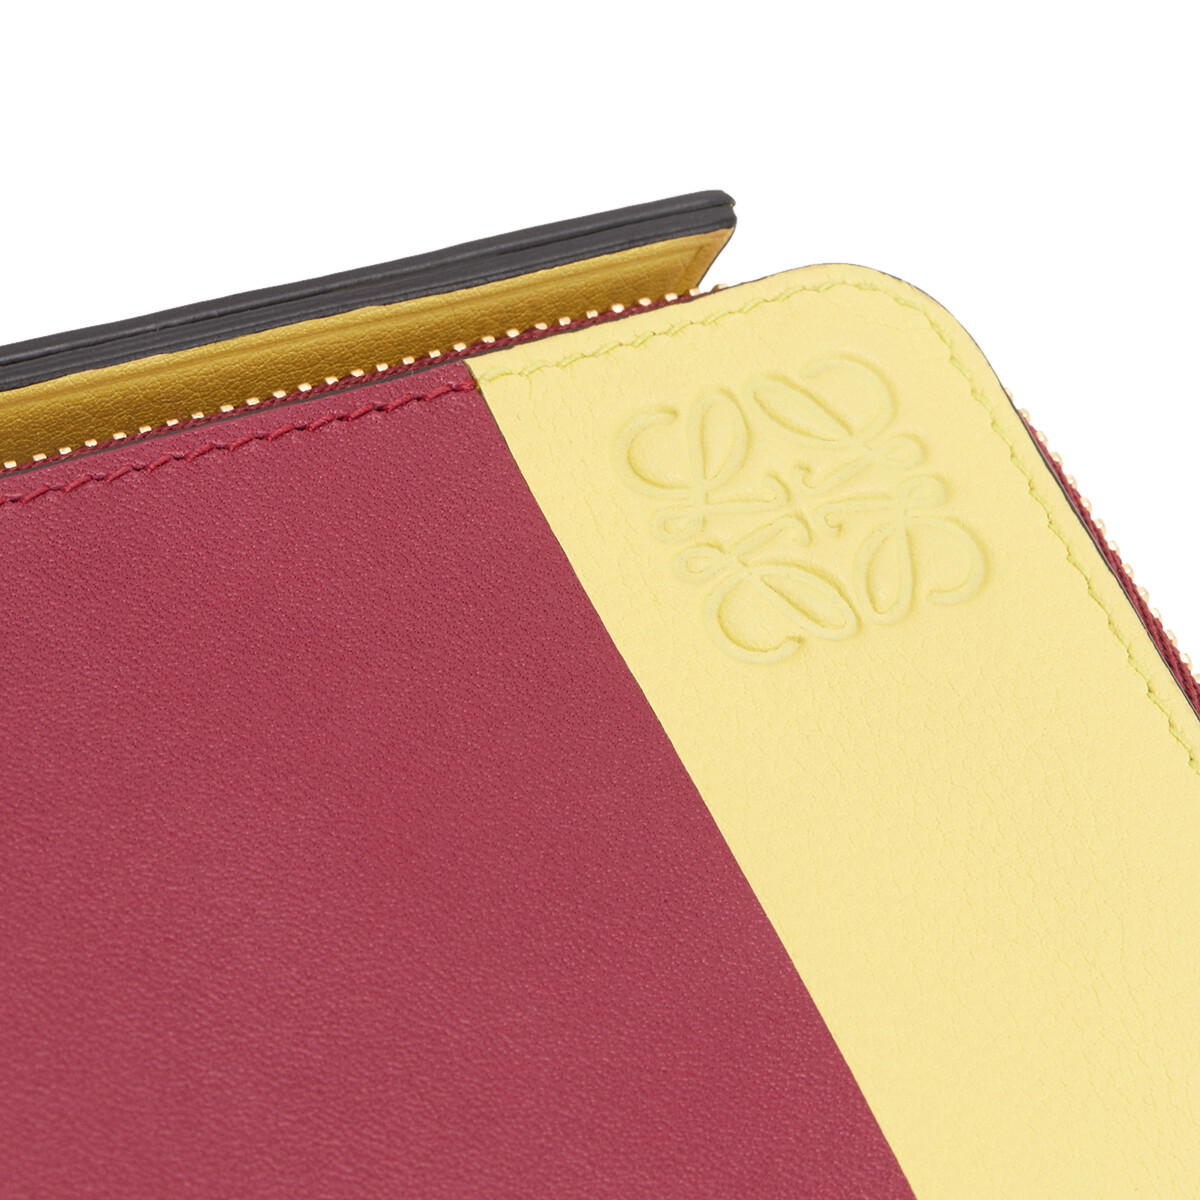 LOEWE 拼色零钱卡包 Raspberry/Yellow front